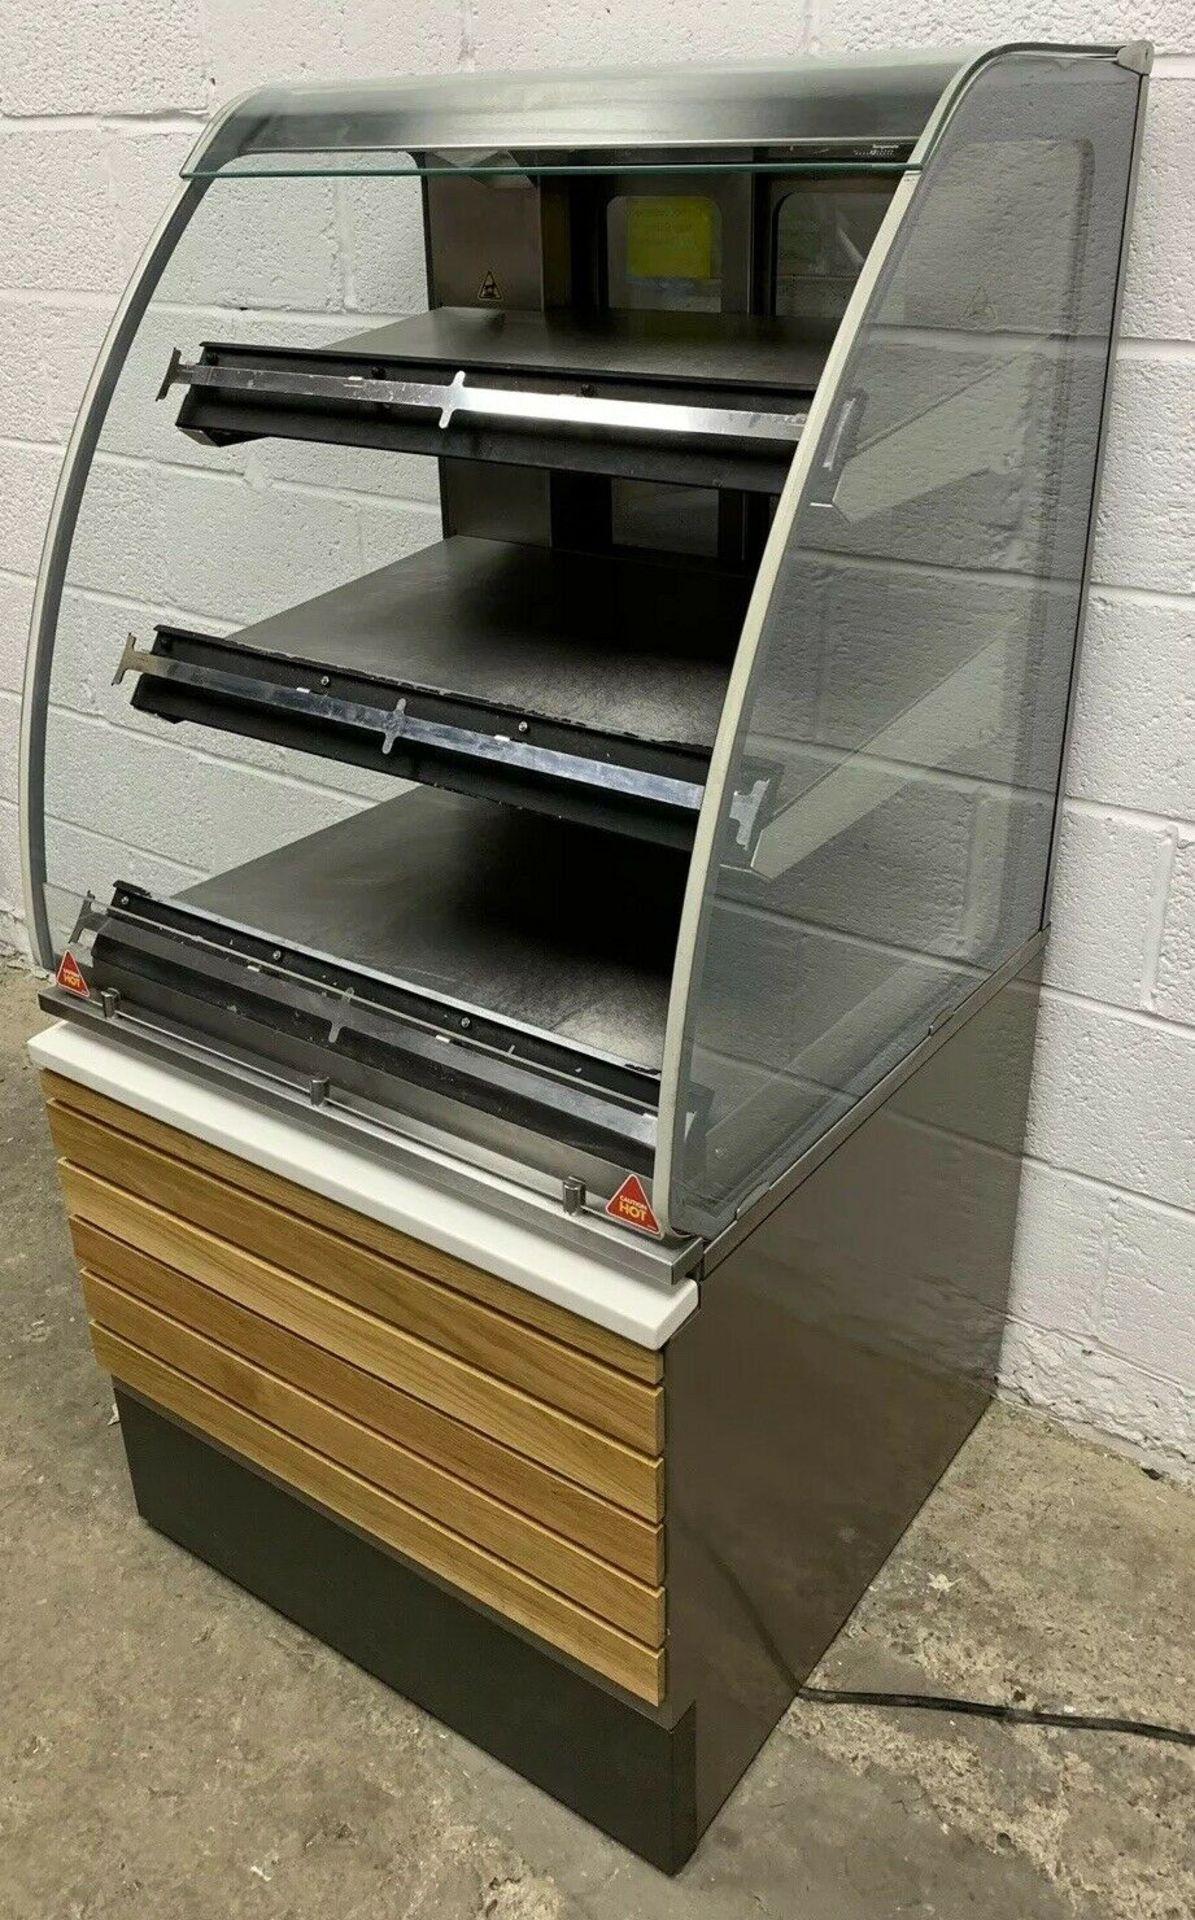 Lot 87 - Fri Jado MC75 Hot Food Display Unit